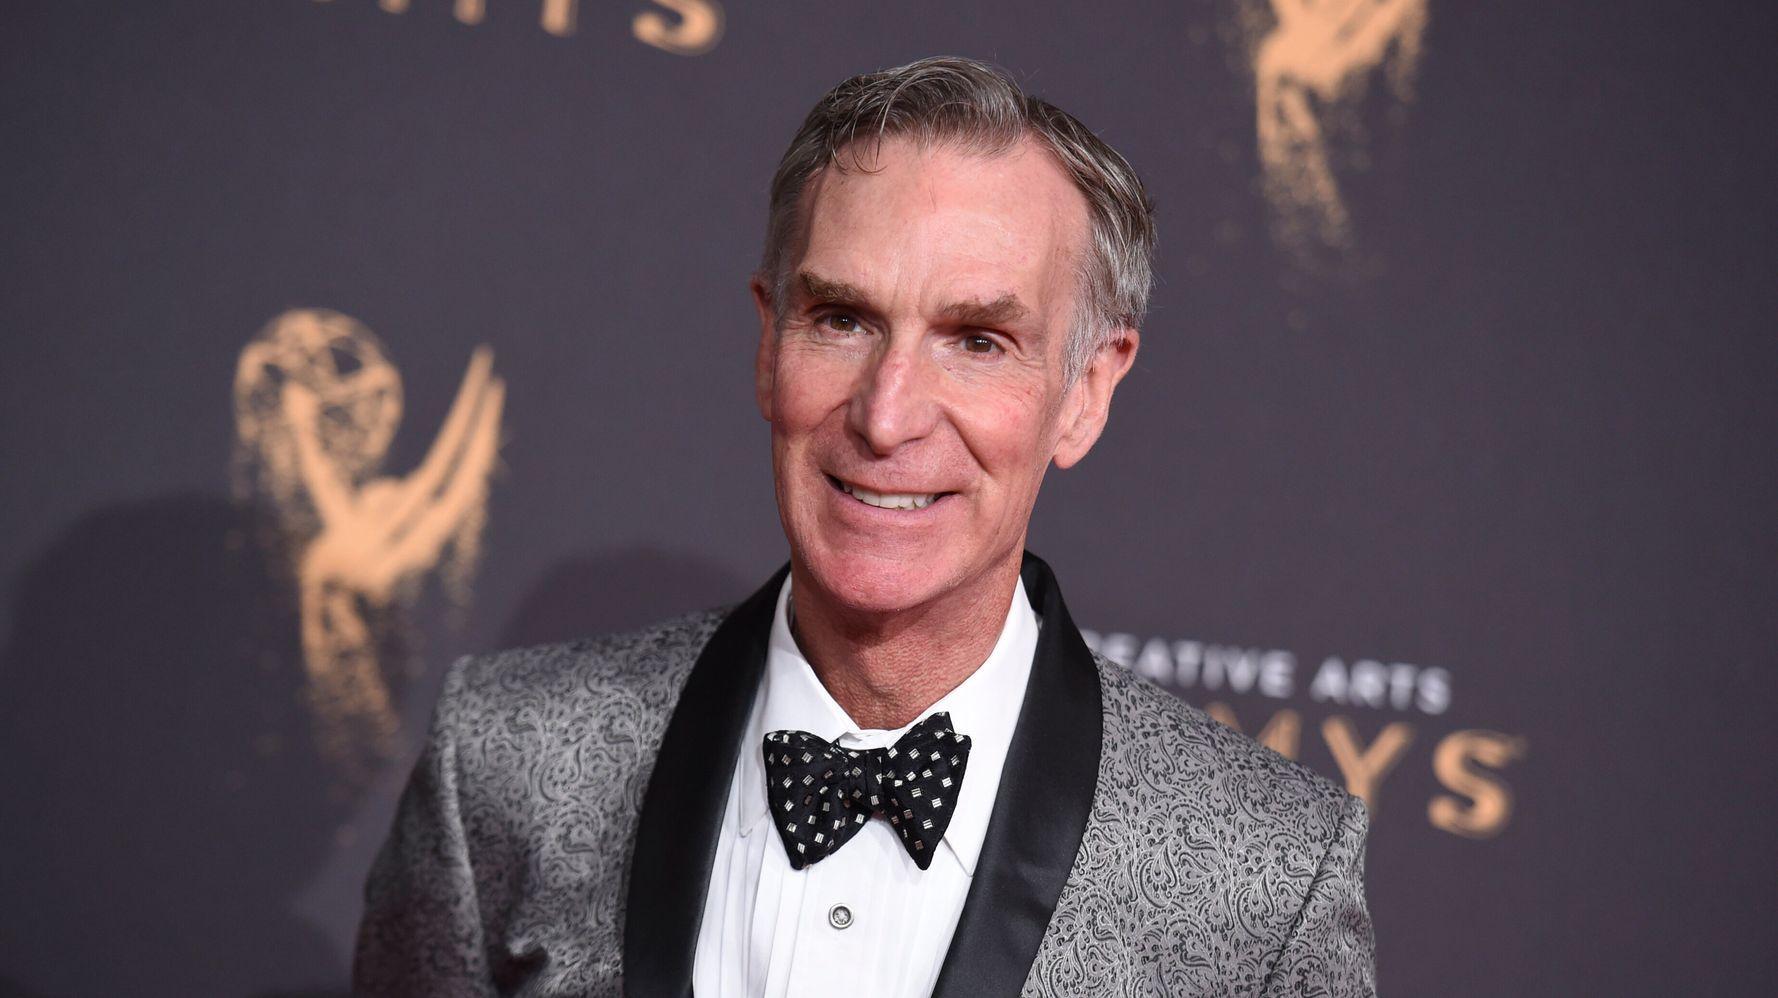 Bill Nye Slams Trump S Climate Failures The U S Has